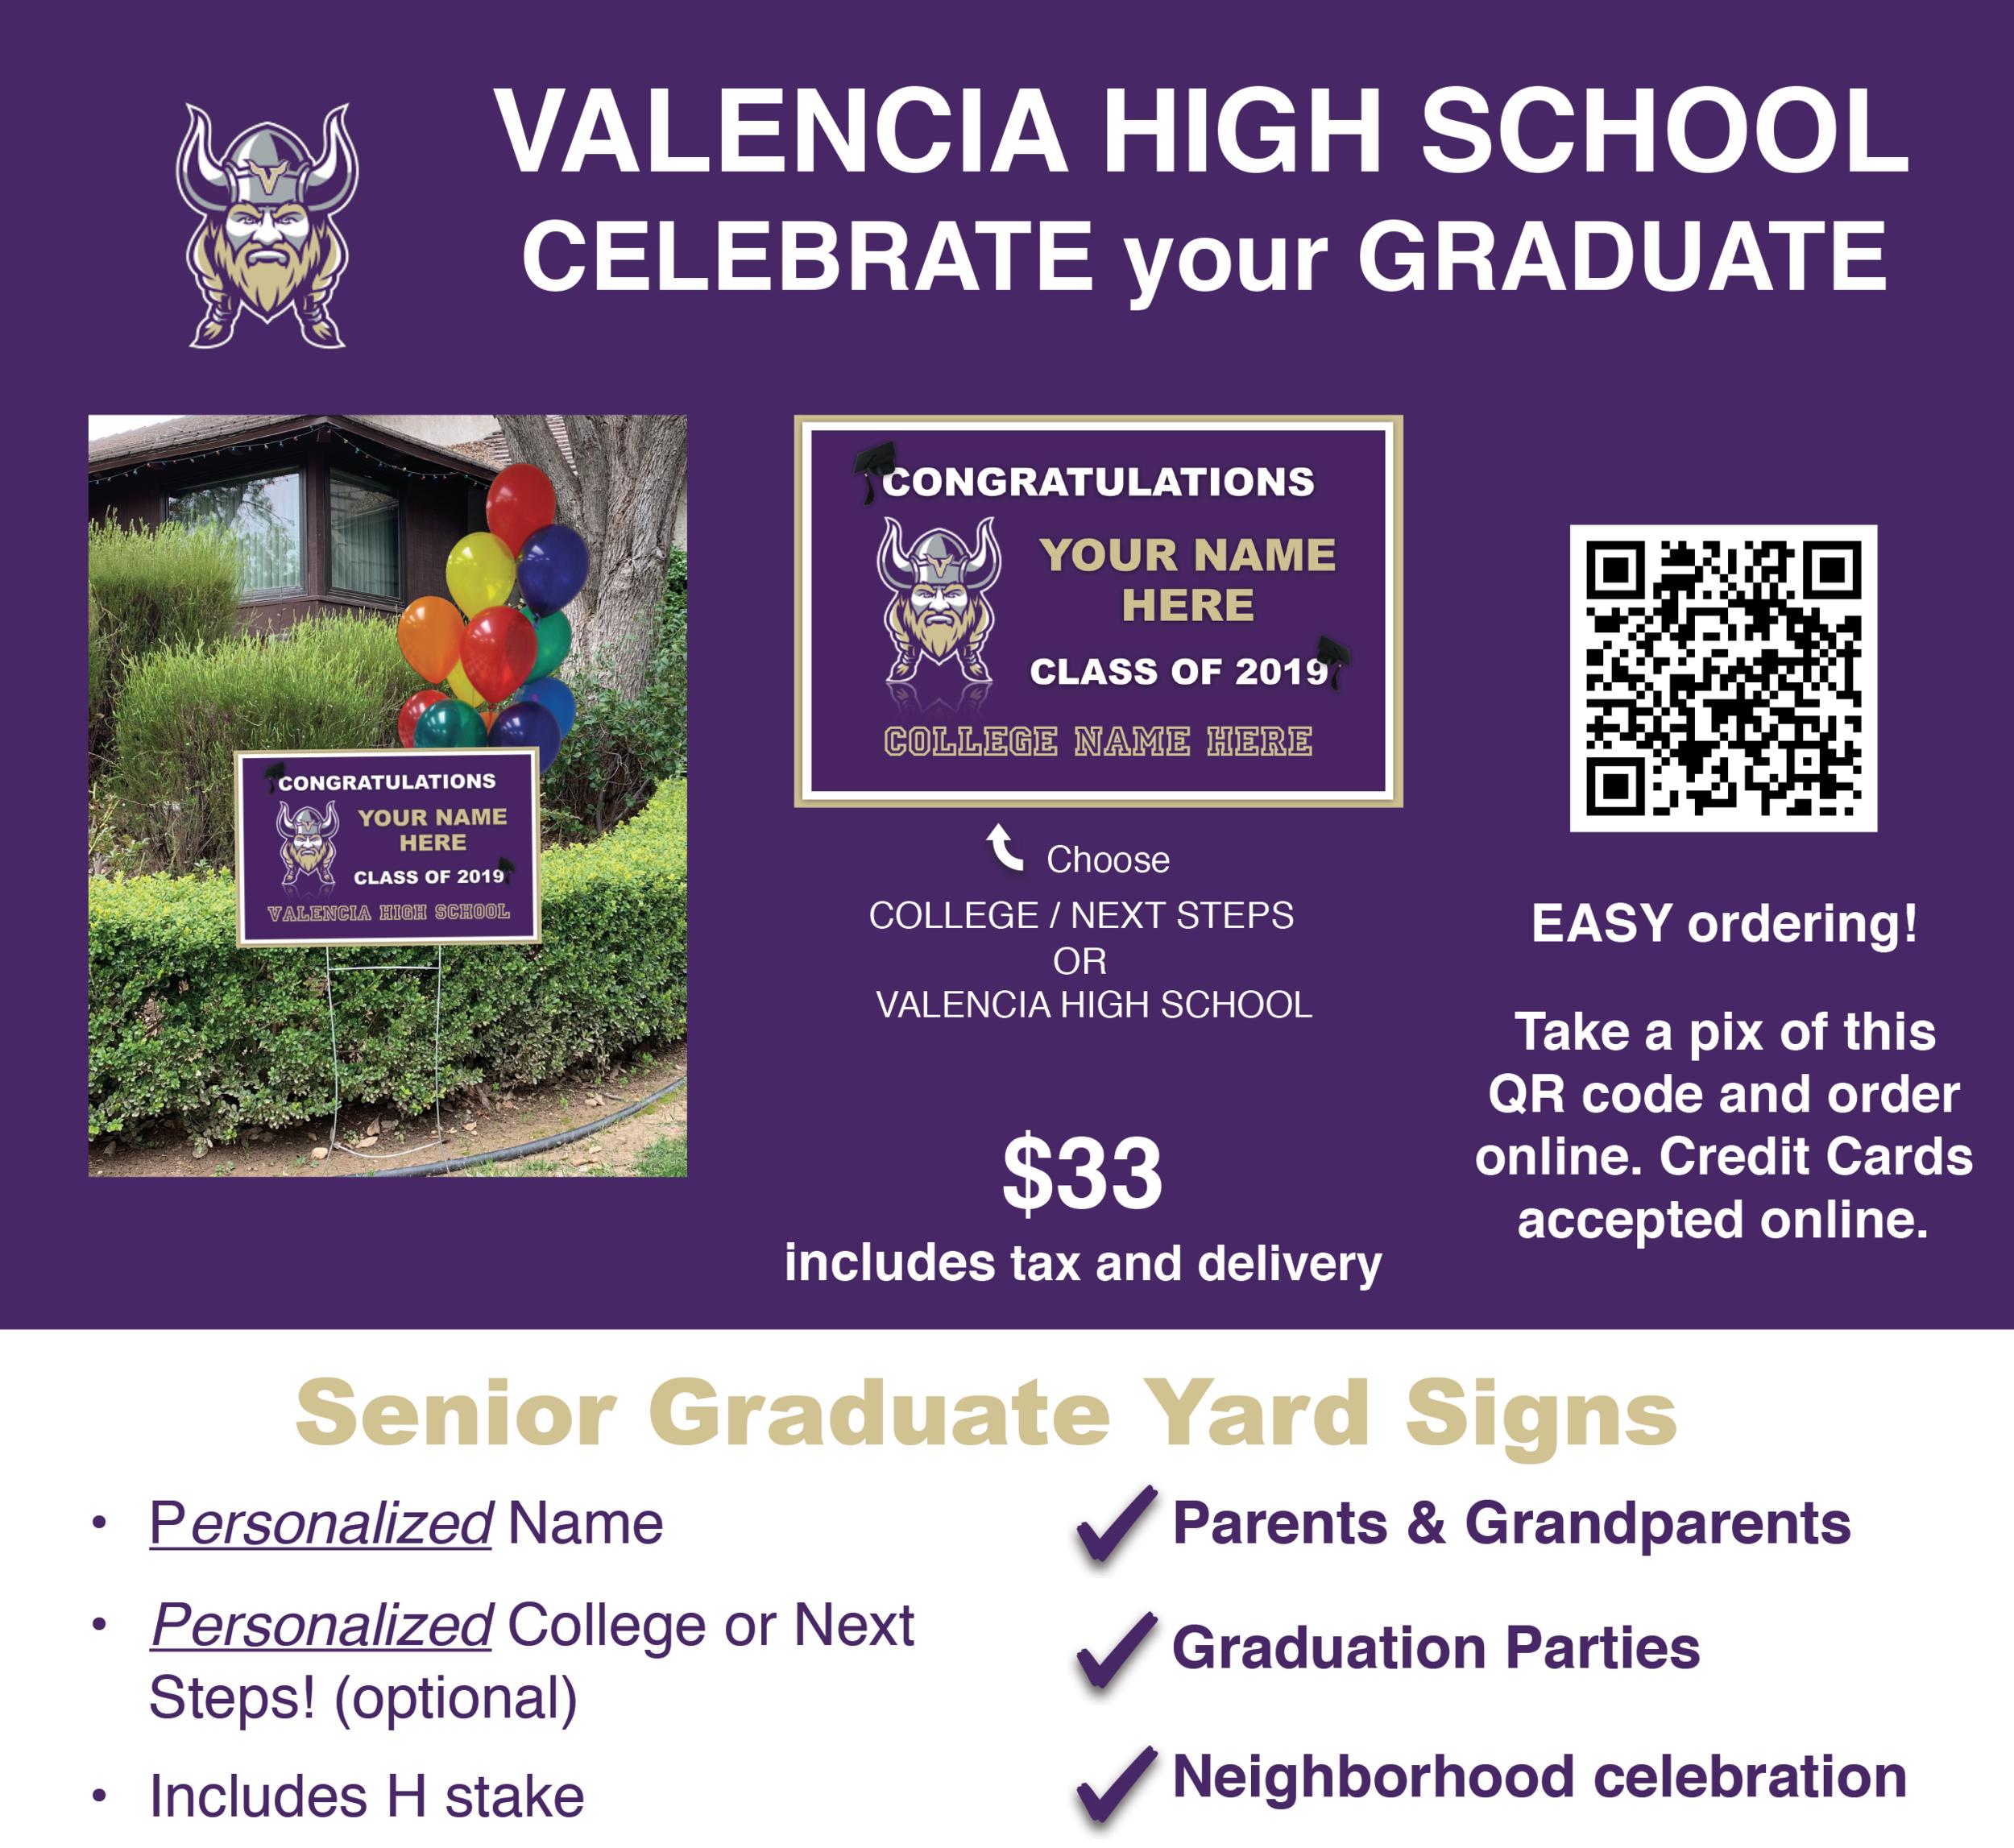 Senior Graduate Yard Signs